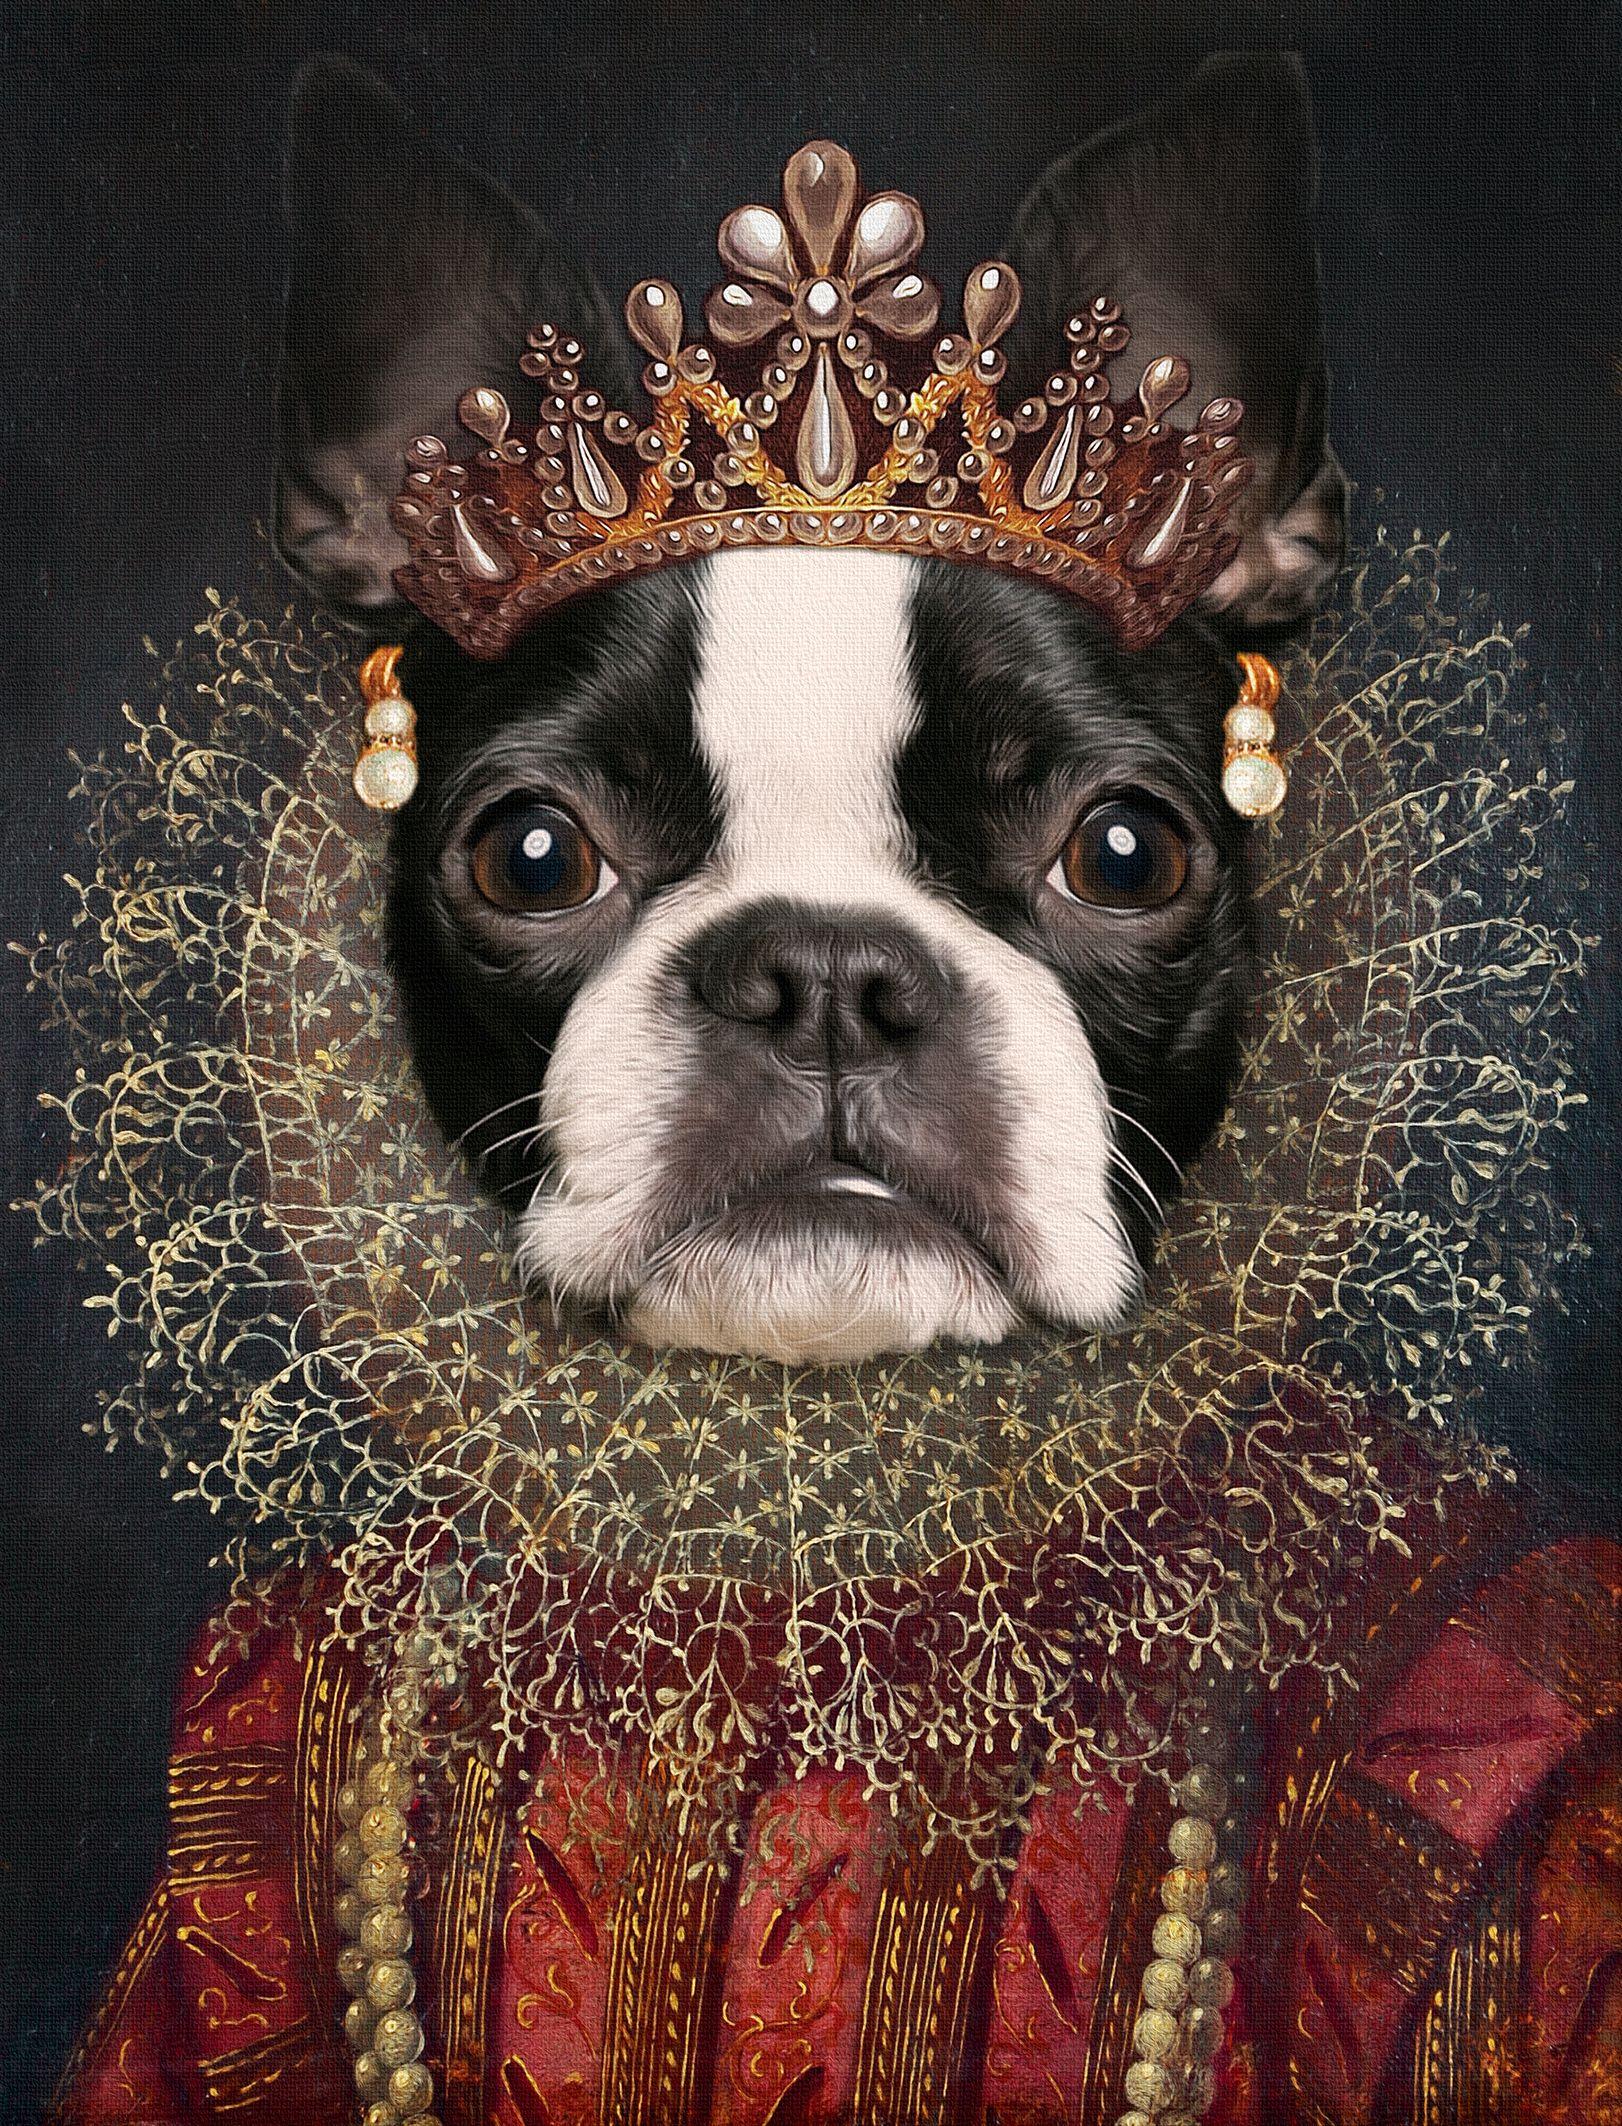 Digital Art Custom dog portrait from photos Art à